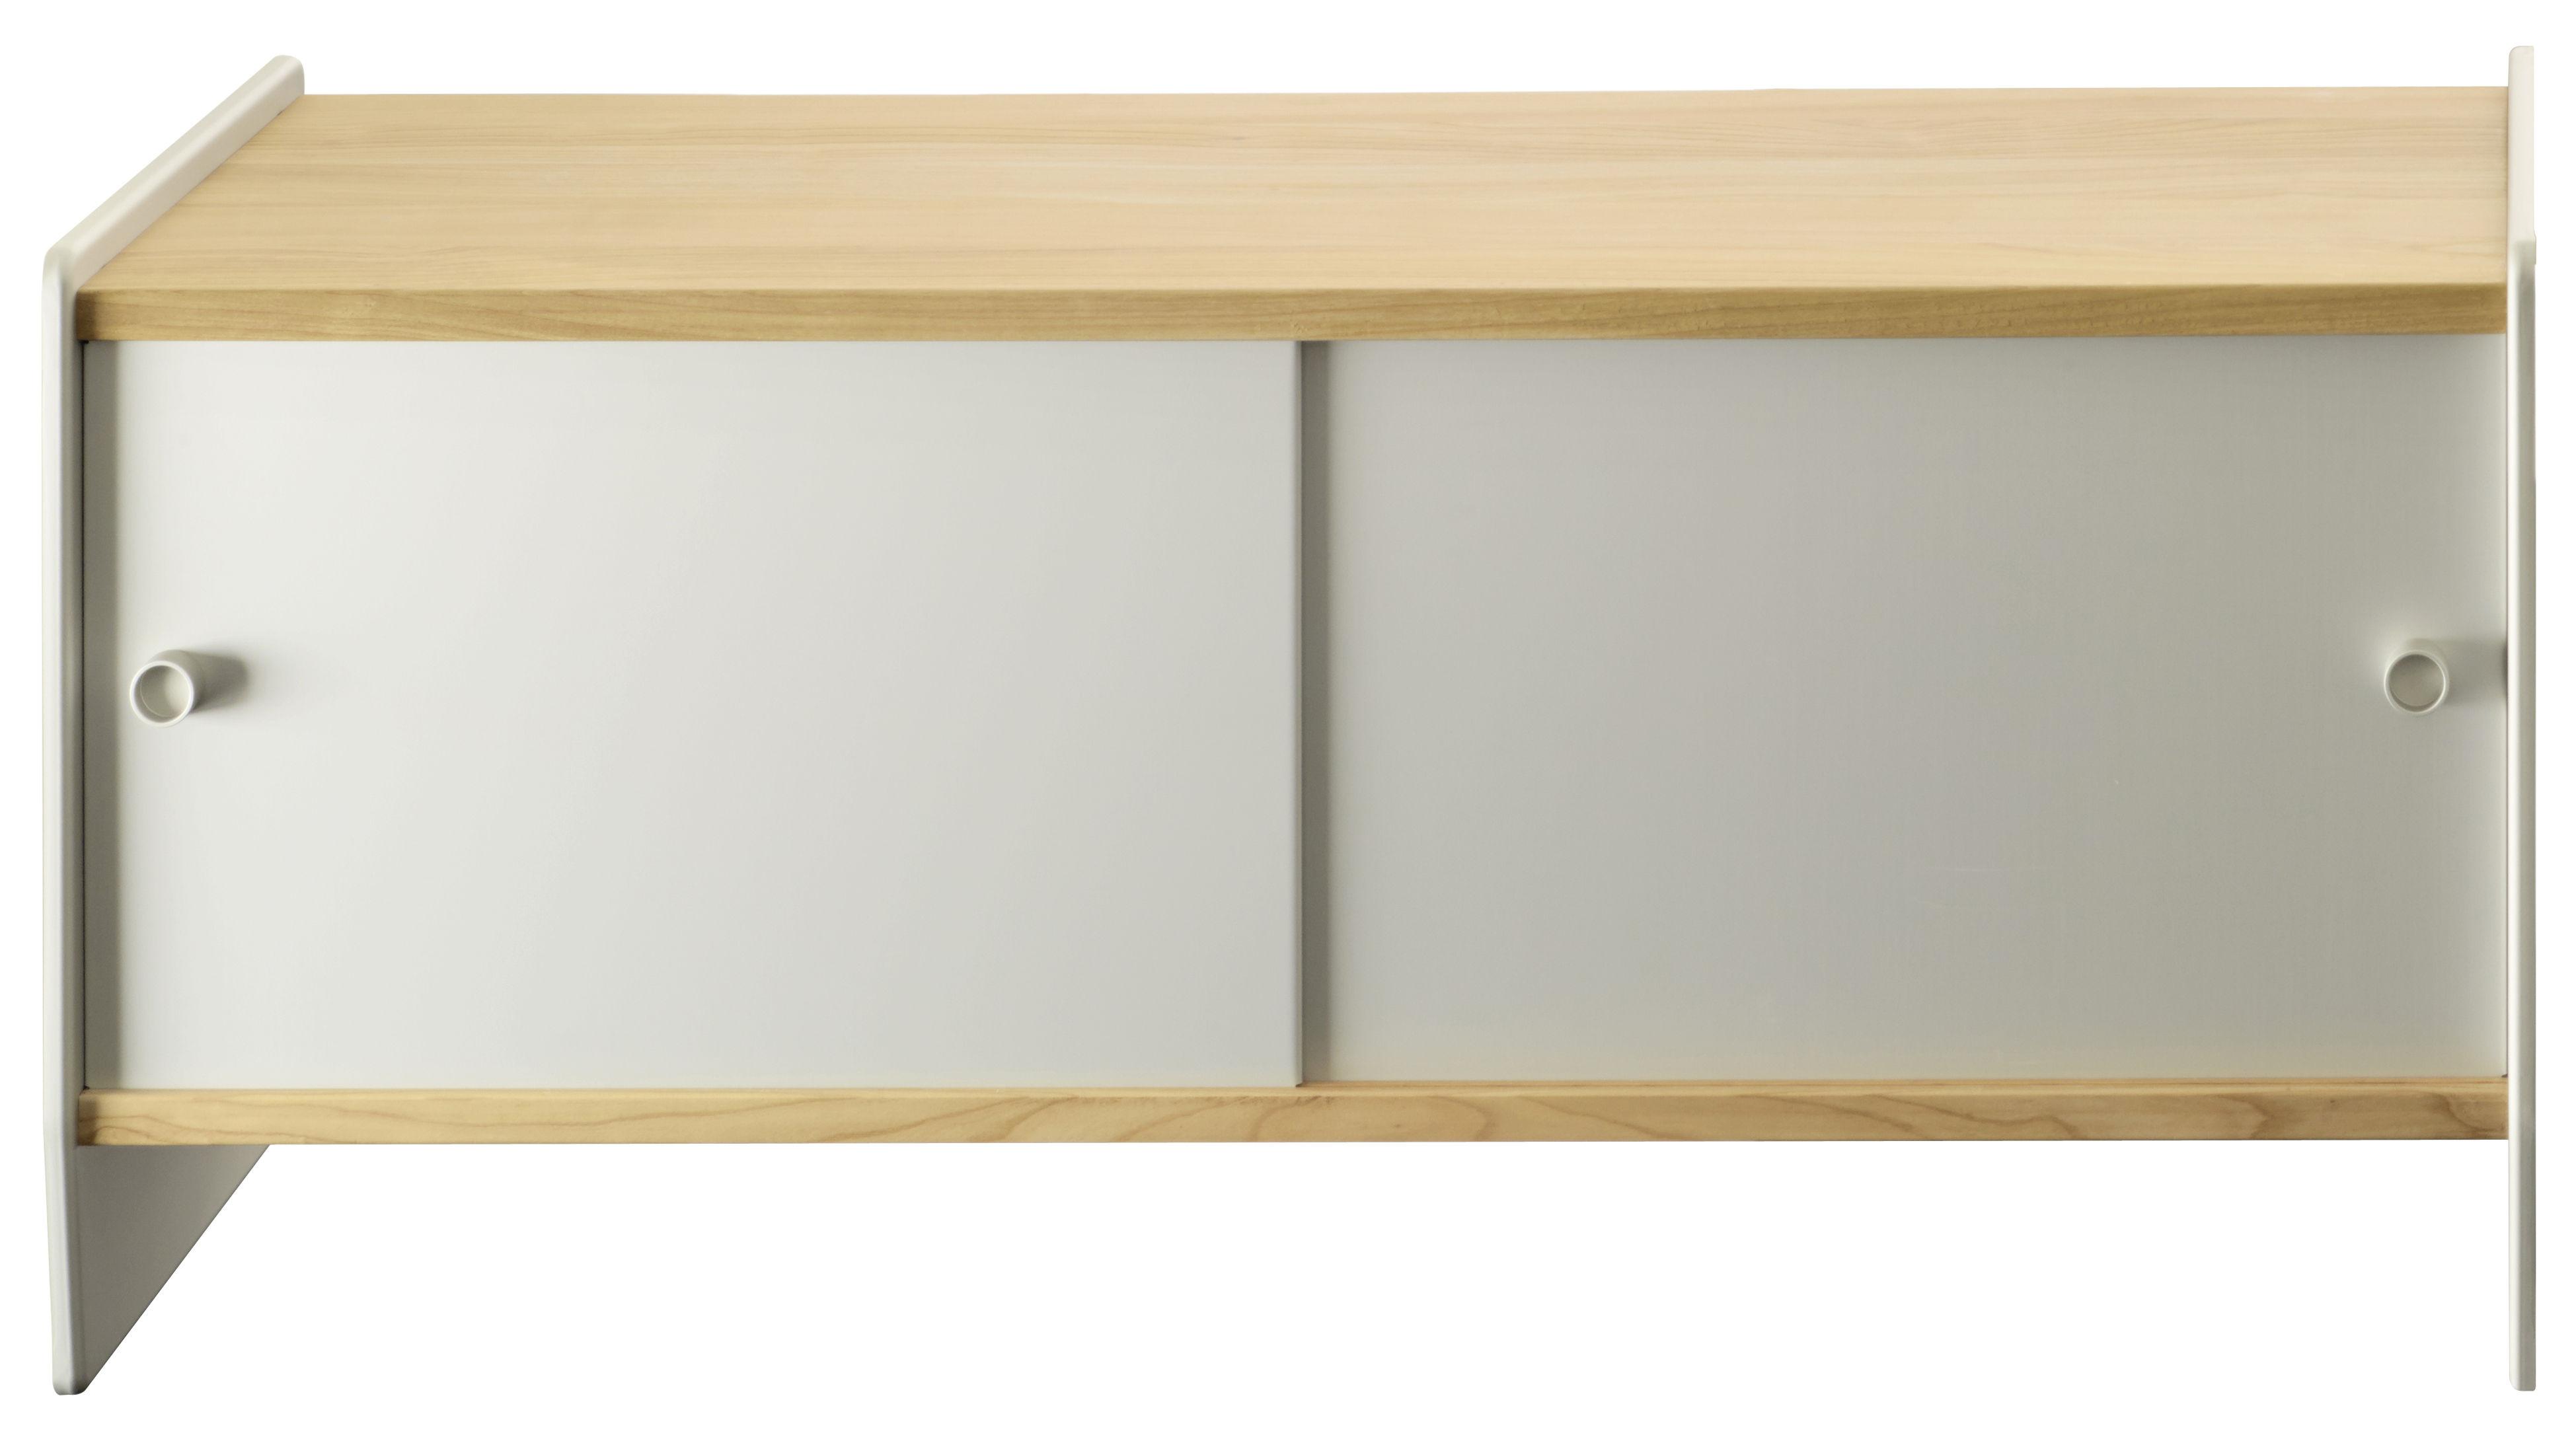 Furniture - Shelves & Storage Furniture - Theca Storage by Magis - Natural cherry wood / Anodized aluminum - Anodized aluminium, MDF plaqué cerisier